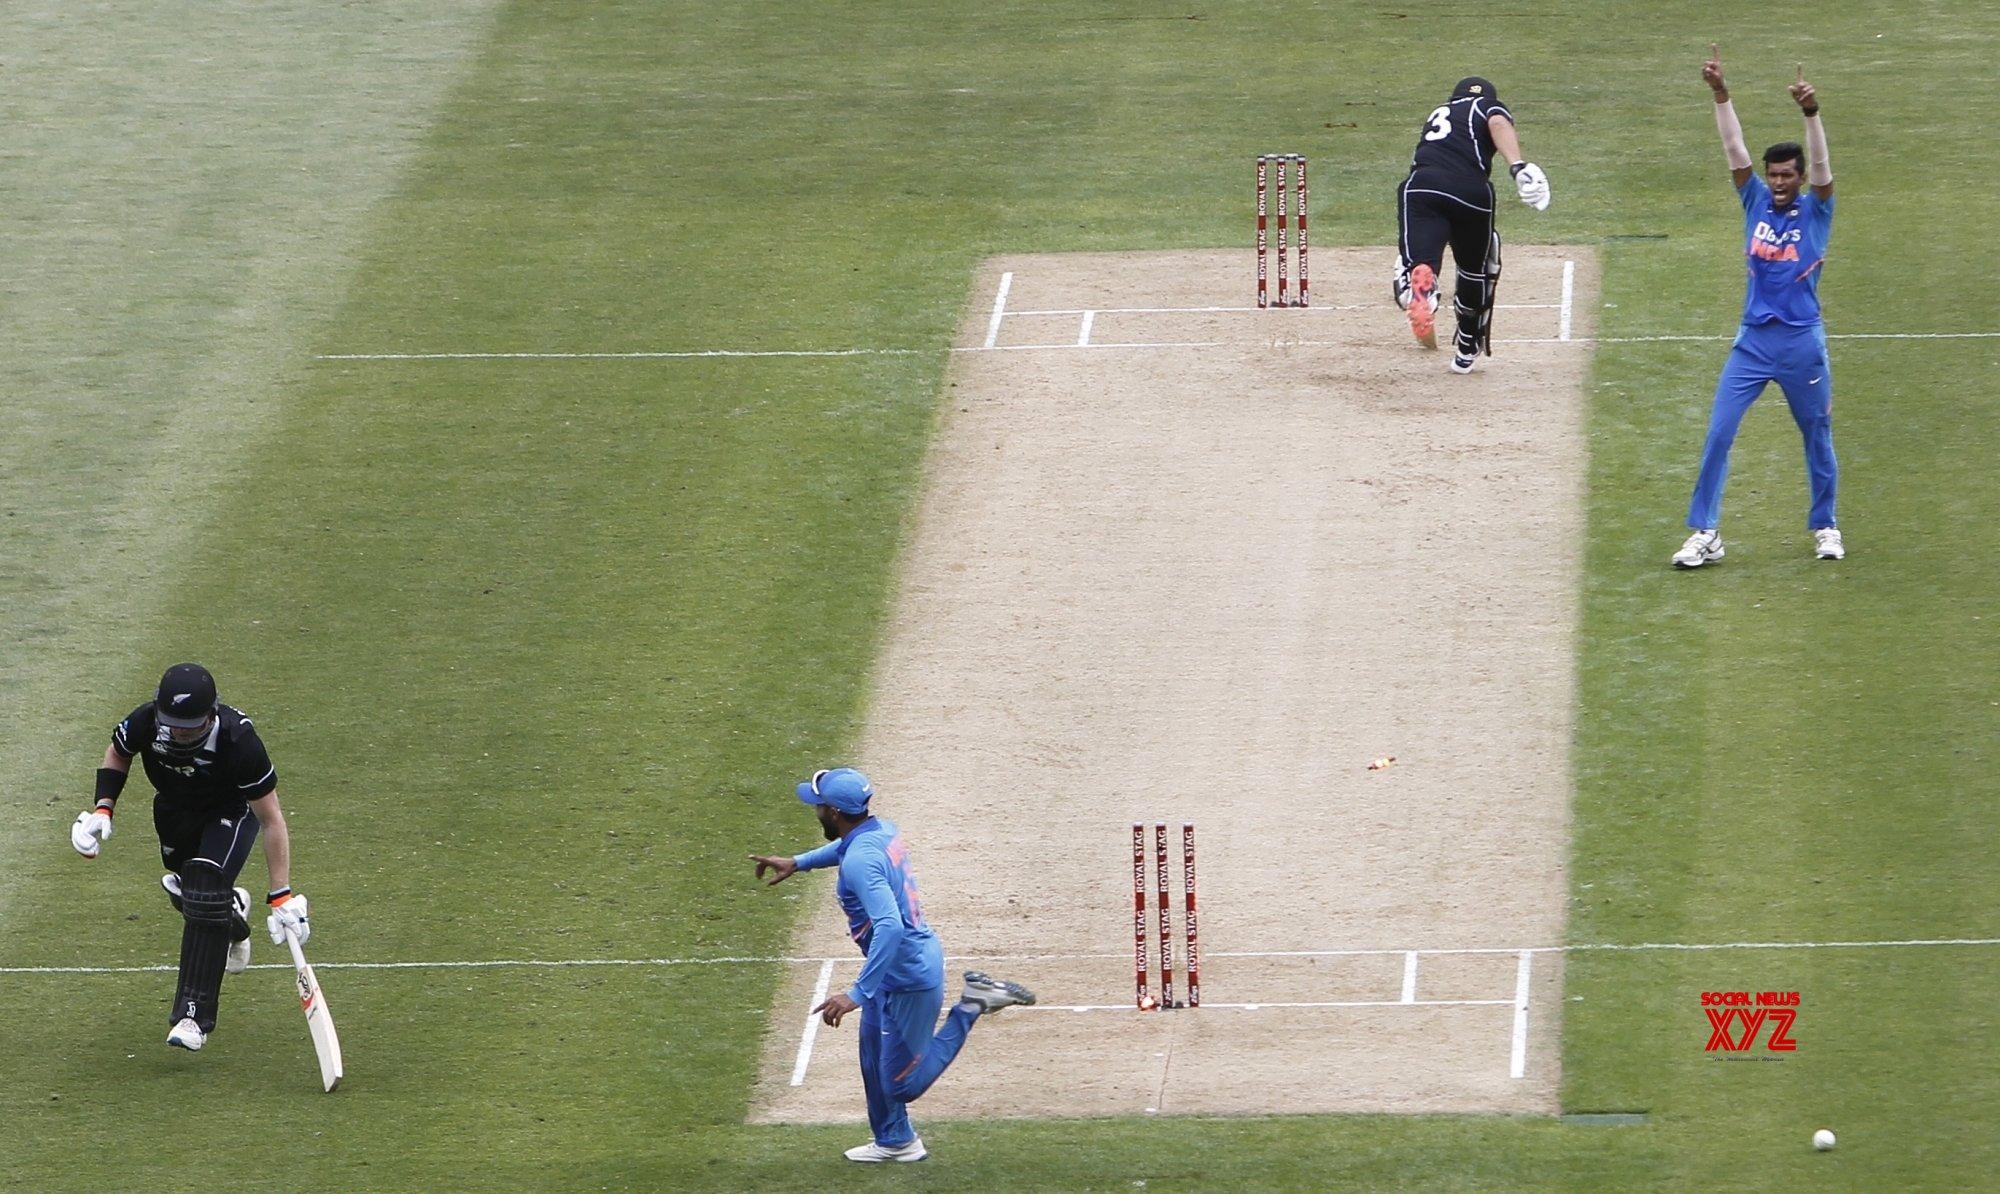 Auckland: 2nd ODI - India Vs New Zealand (Batch - 7) #Gallery